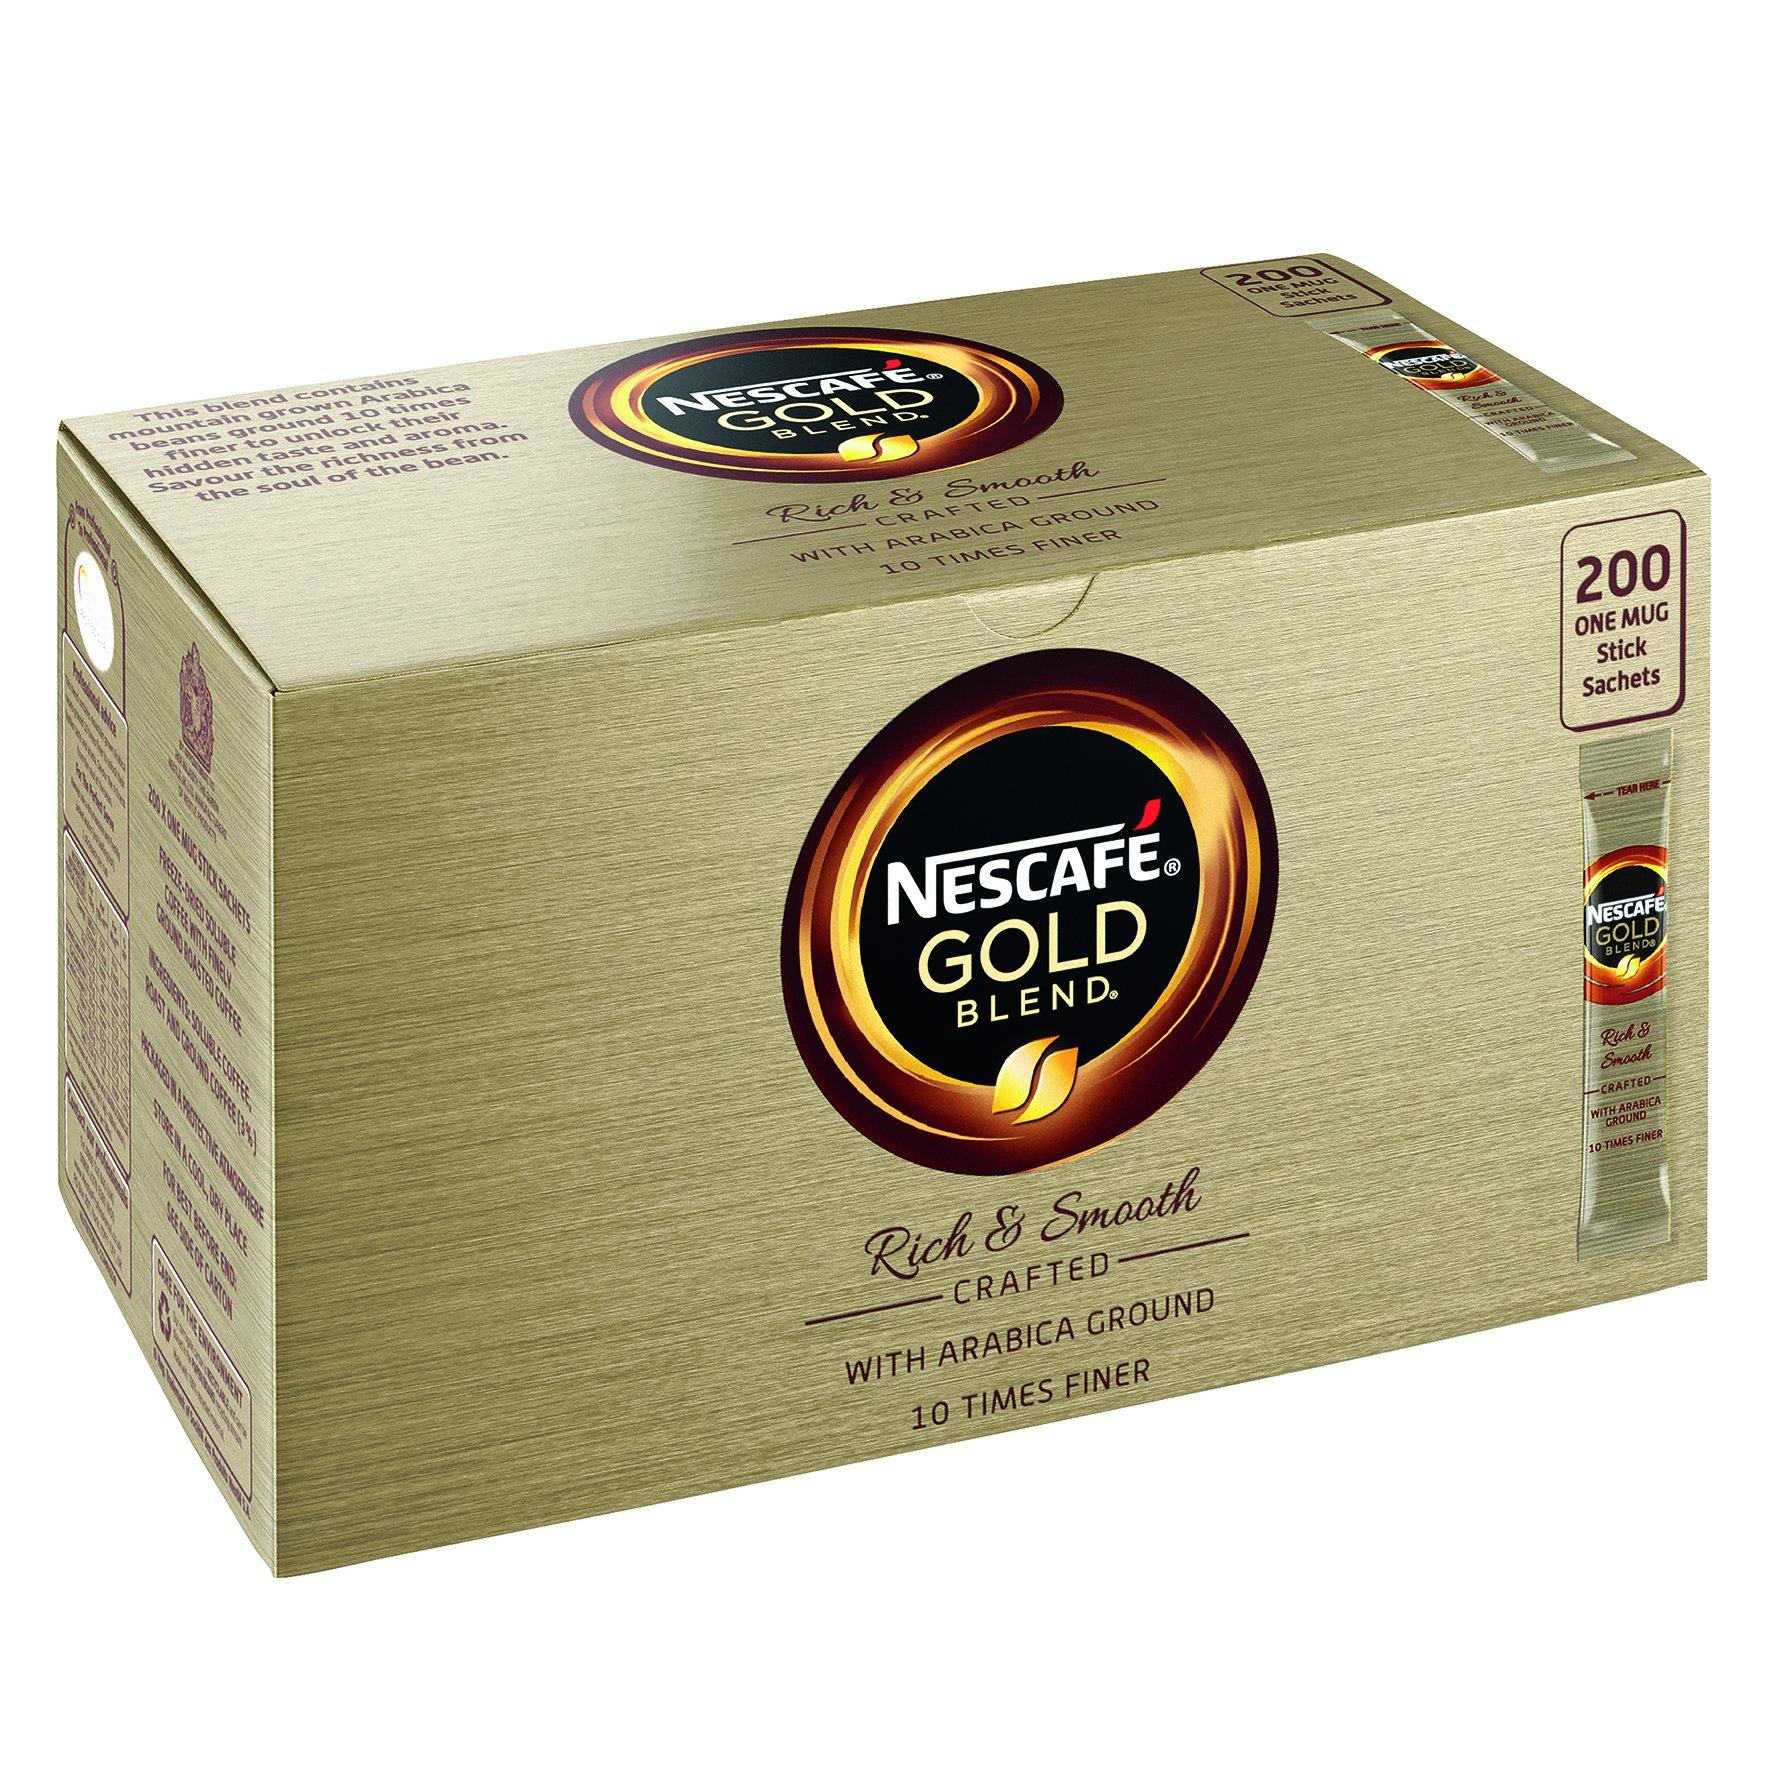 NESCAFE GOLD BLEND Coffee Sticks (200)